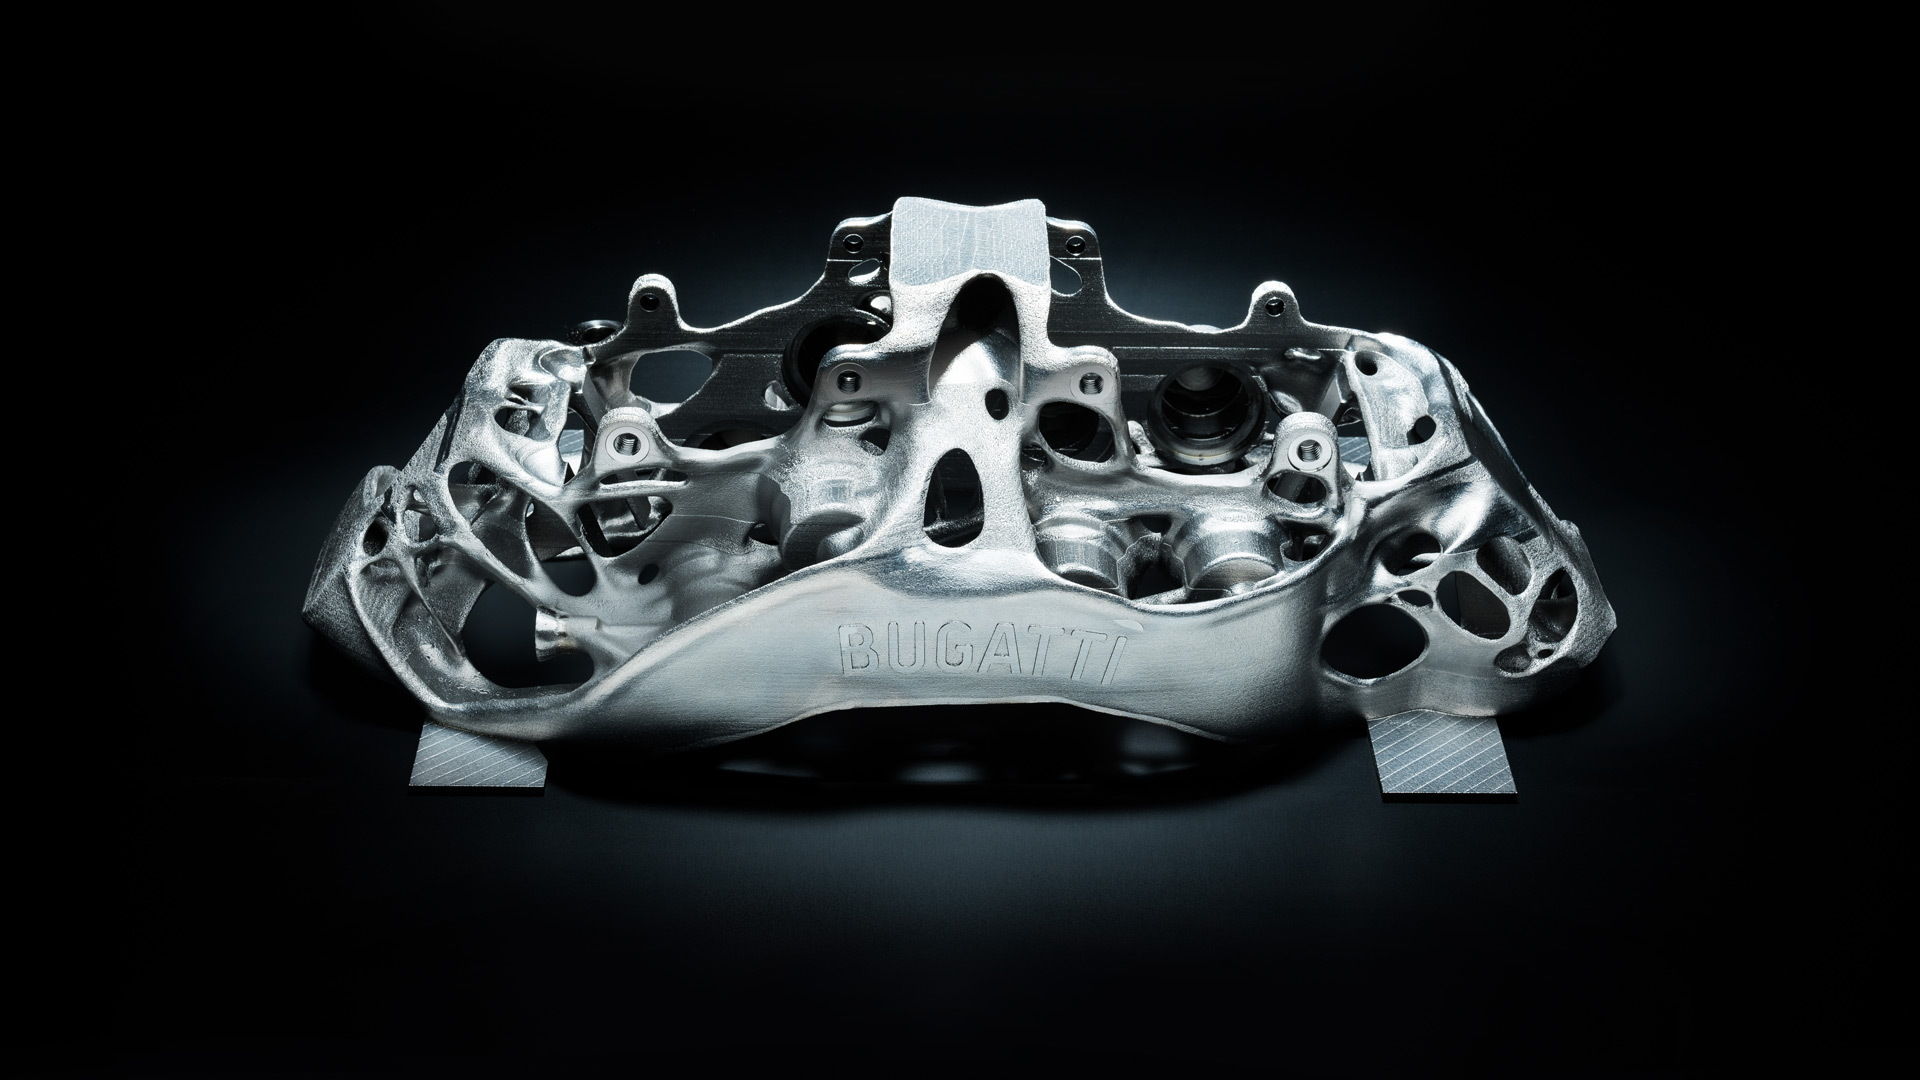 Bugatti Chiron brake caliper made using 3D printing